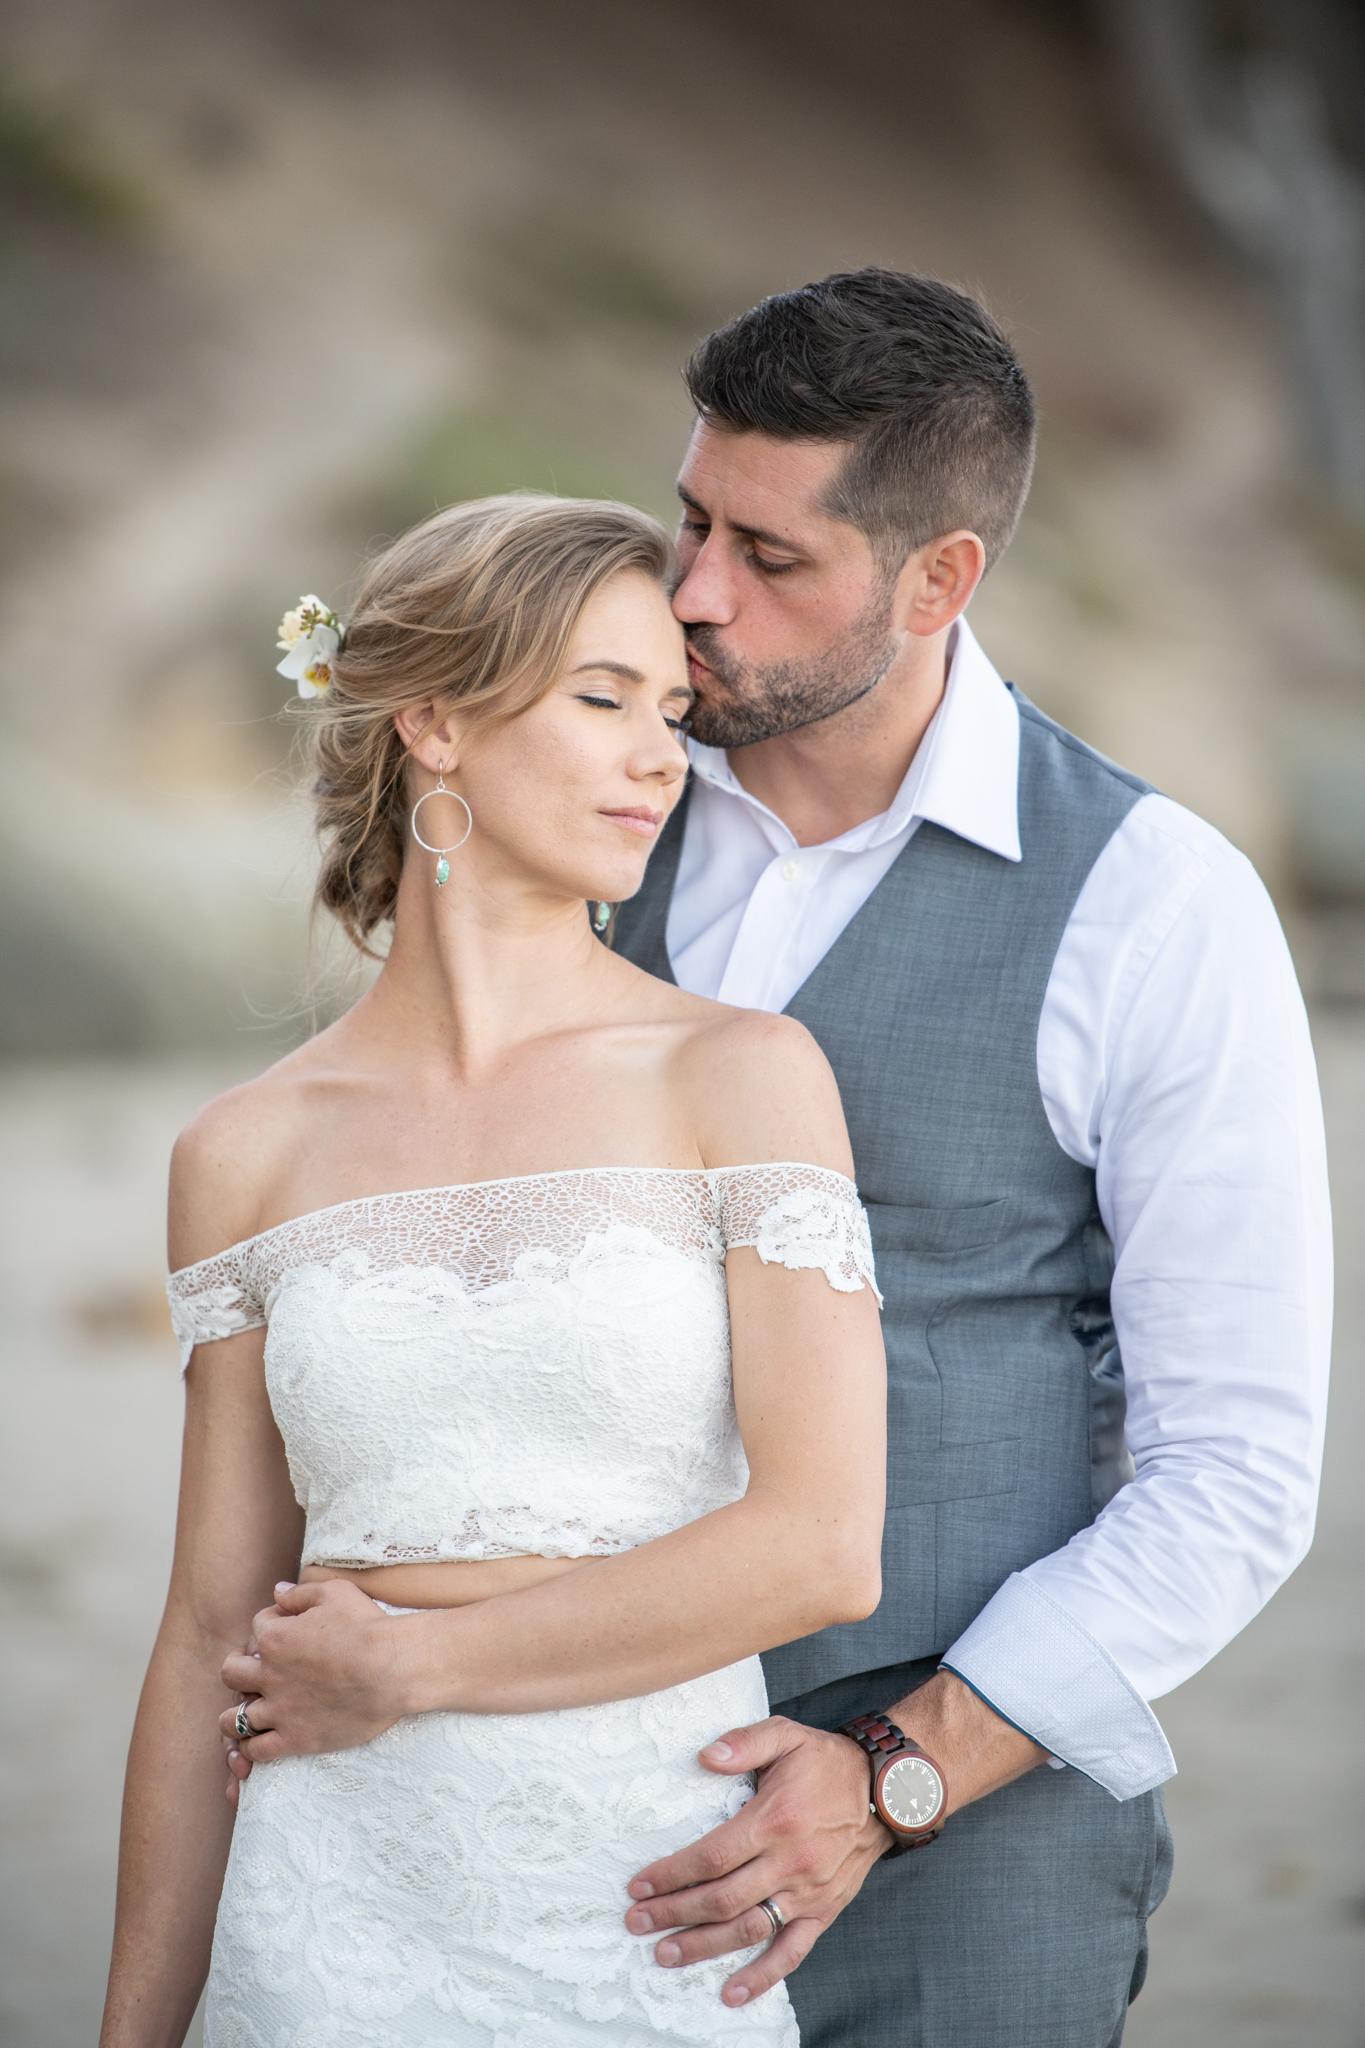 79_PRVW_Jenny_Ken_Wedding_Trevor_Hooper_Photo.jpg